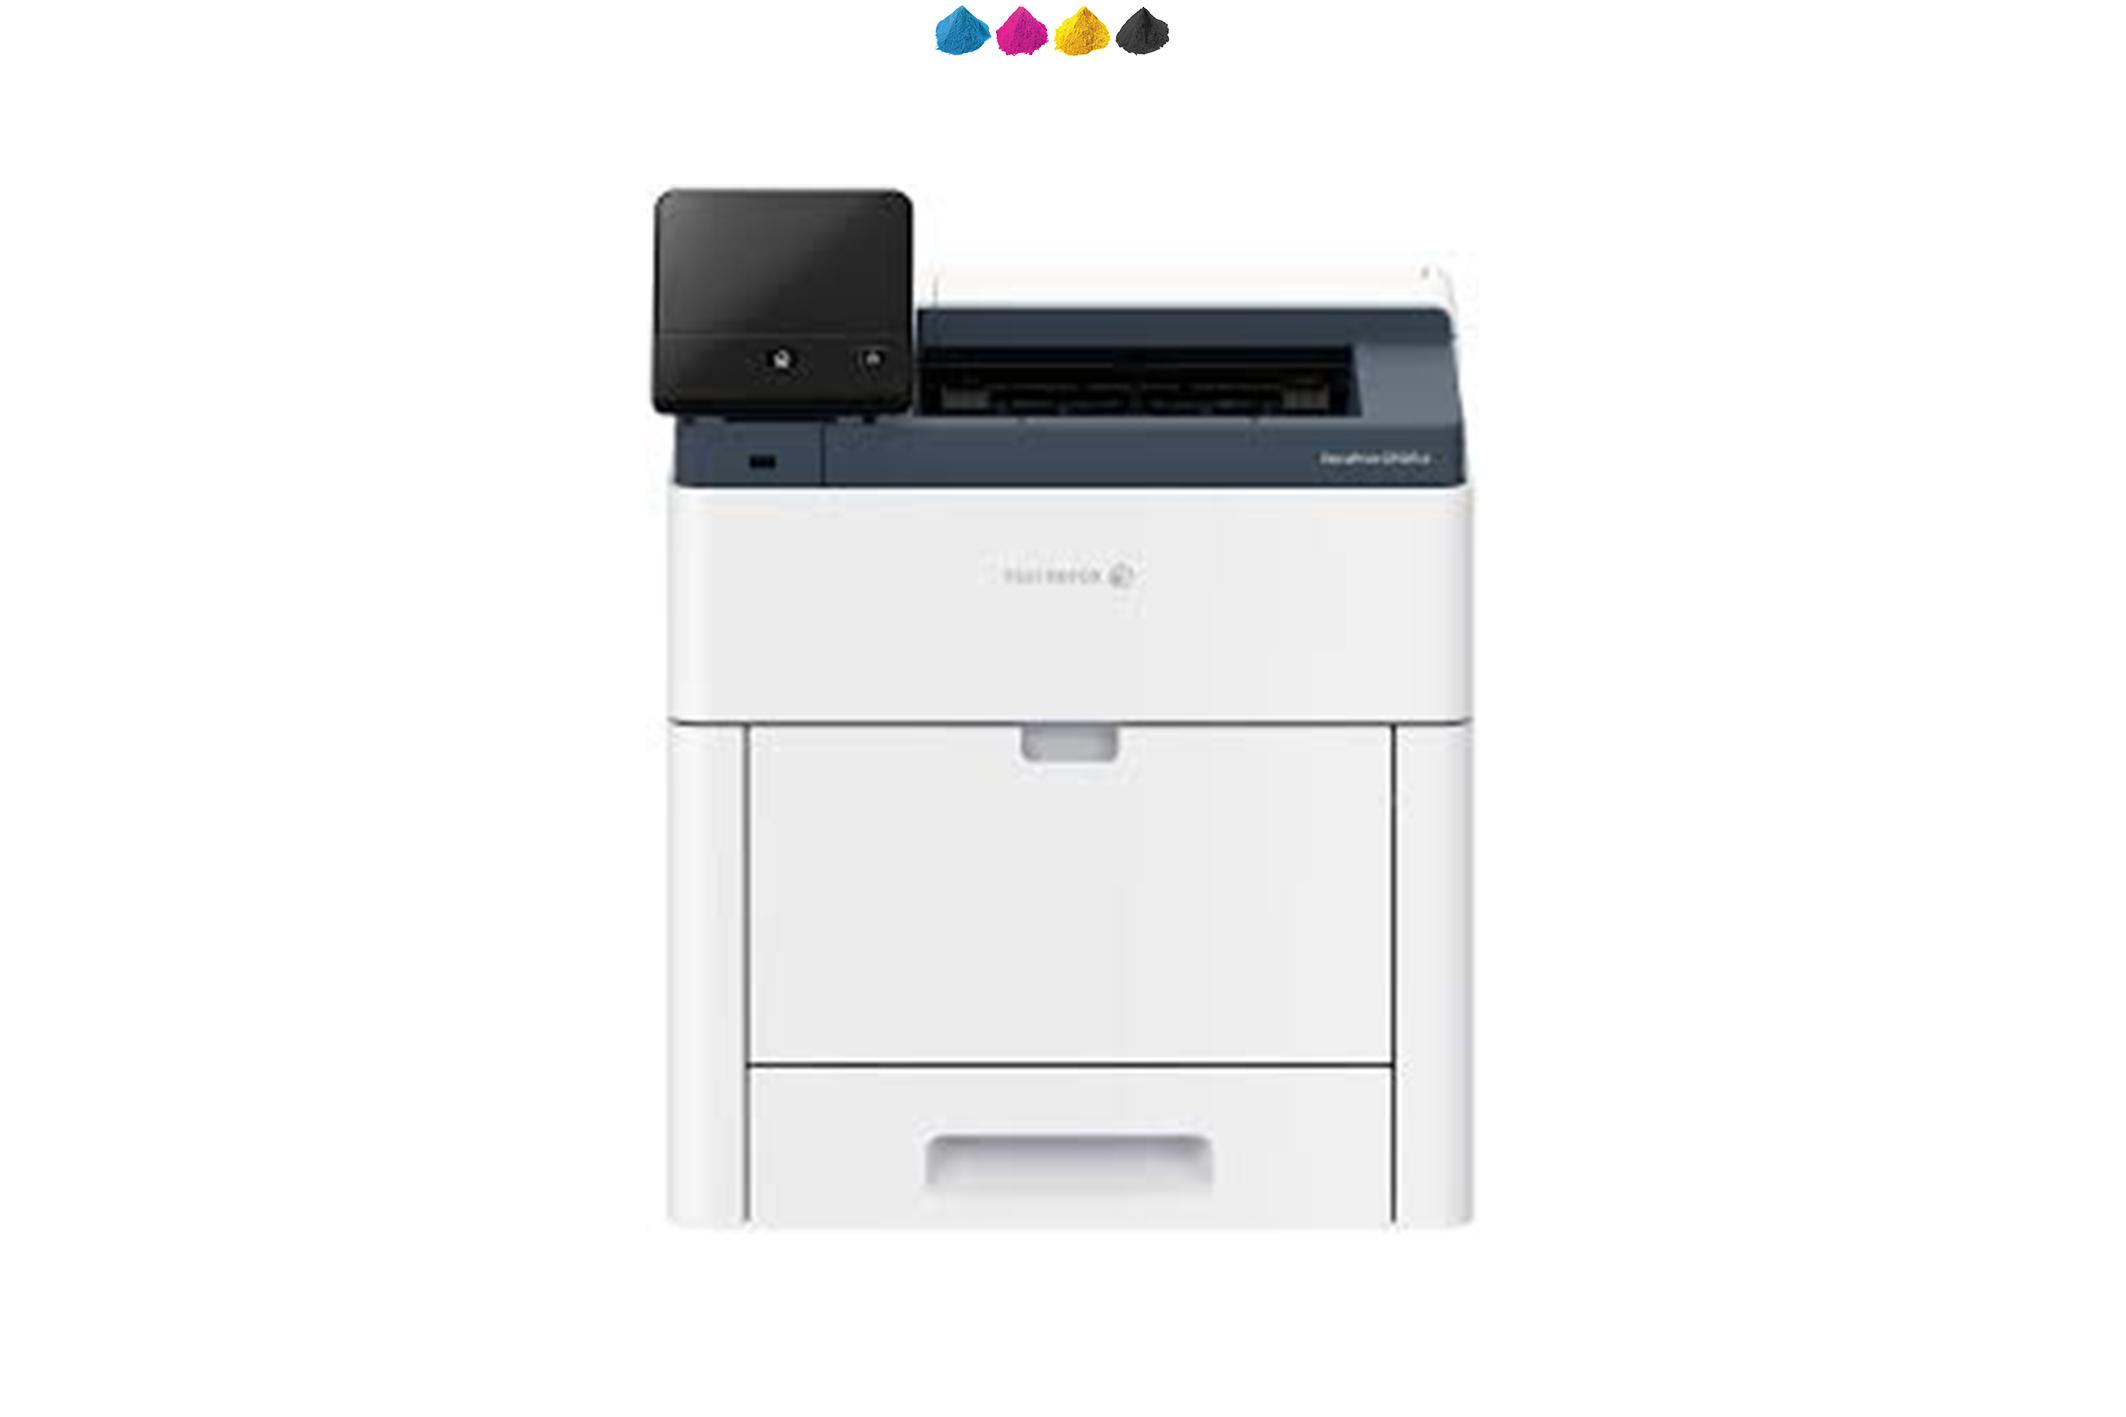 FujiFilm Docuprint CP505d Printer